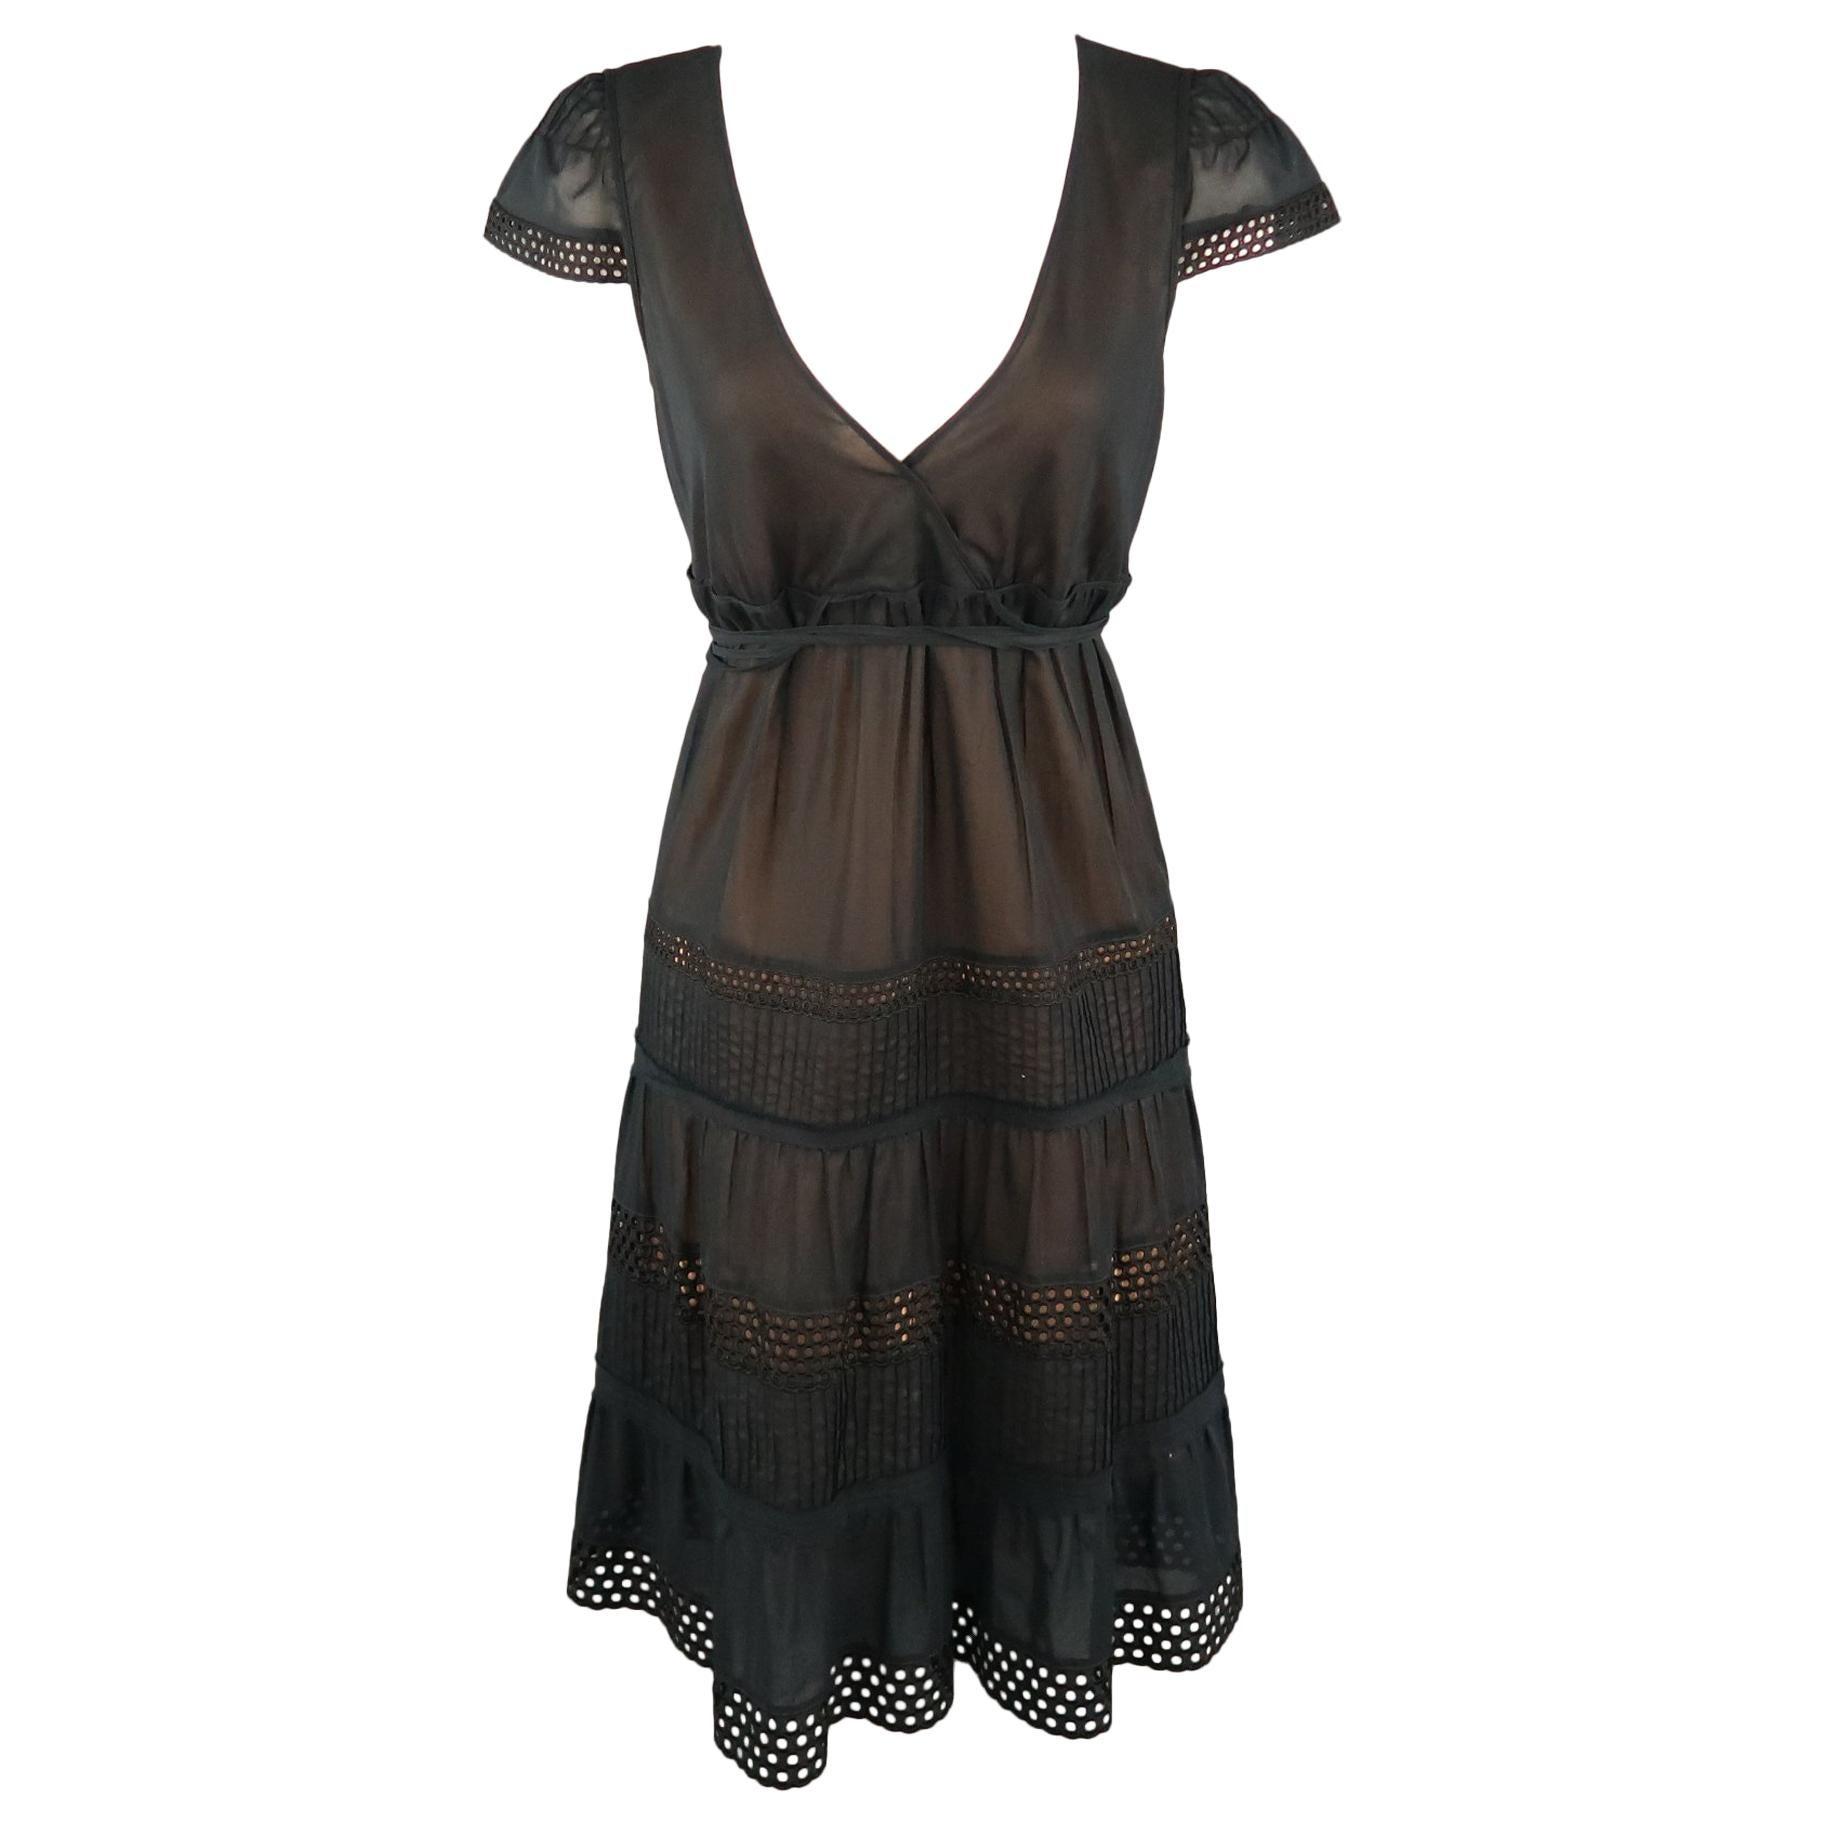 AKRIS Size 8 Black Layered Skirt Peasant Dress